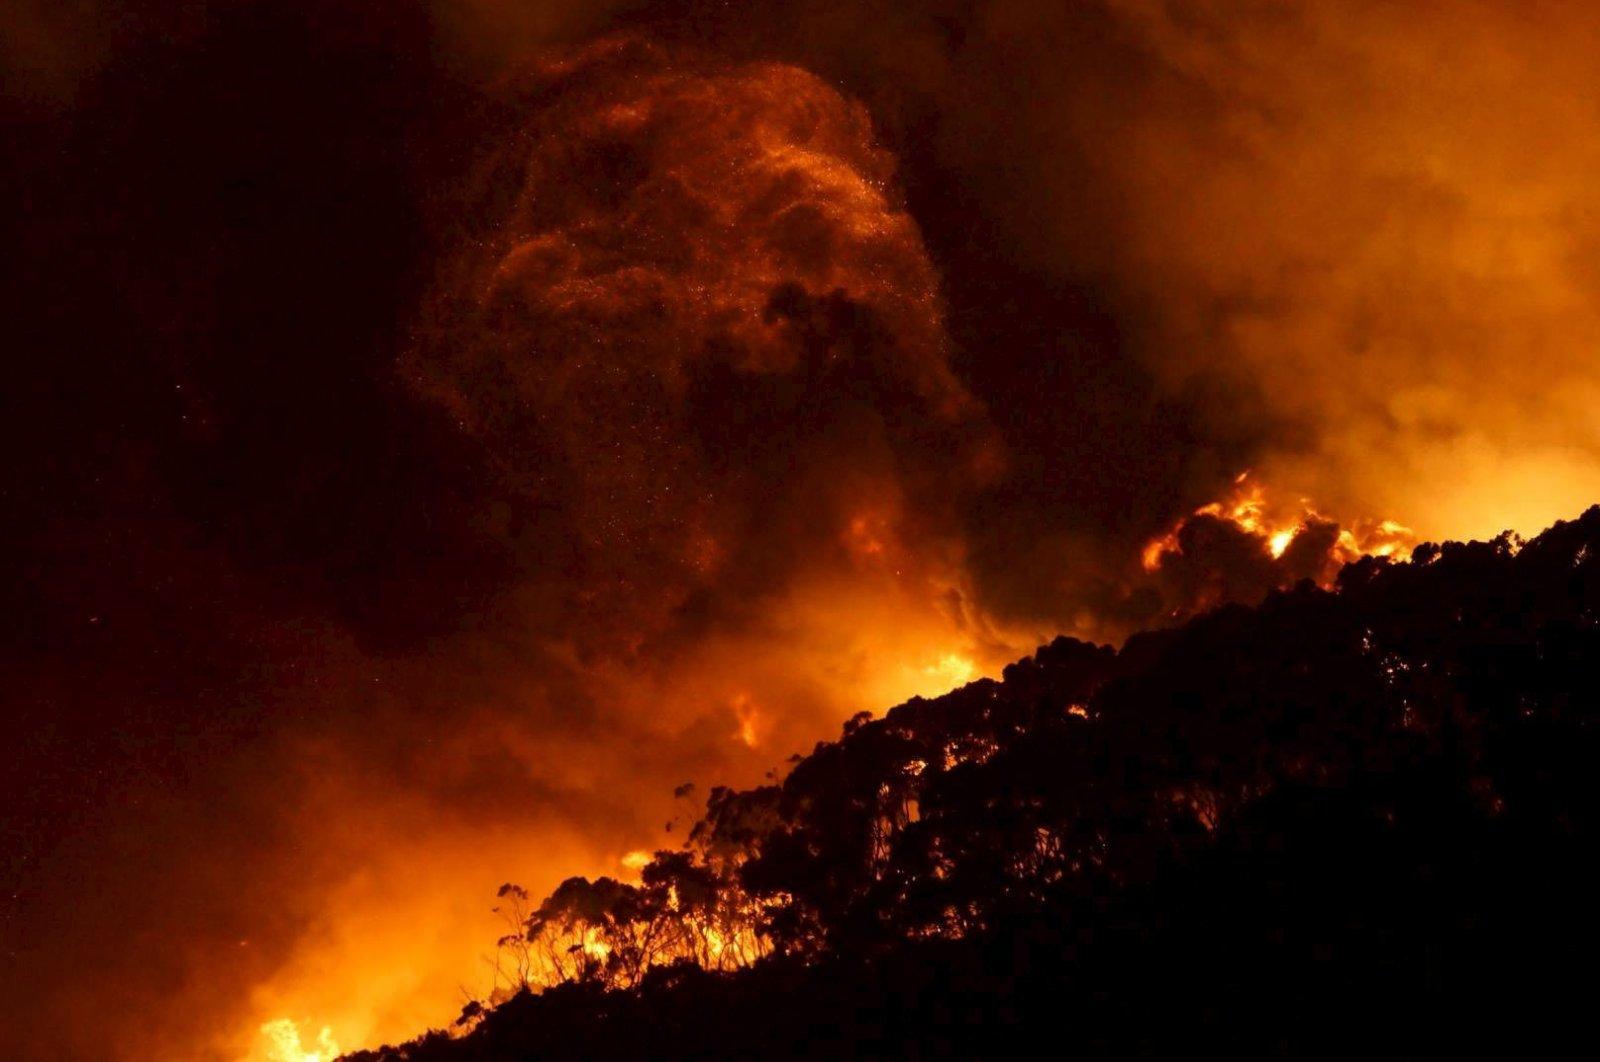 A bushfire burns at Wye River near Lorne, south of Melbourne, December 25, 2015. (Reuters/Keith Pakenham/AAP)